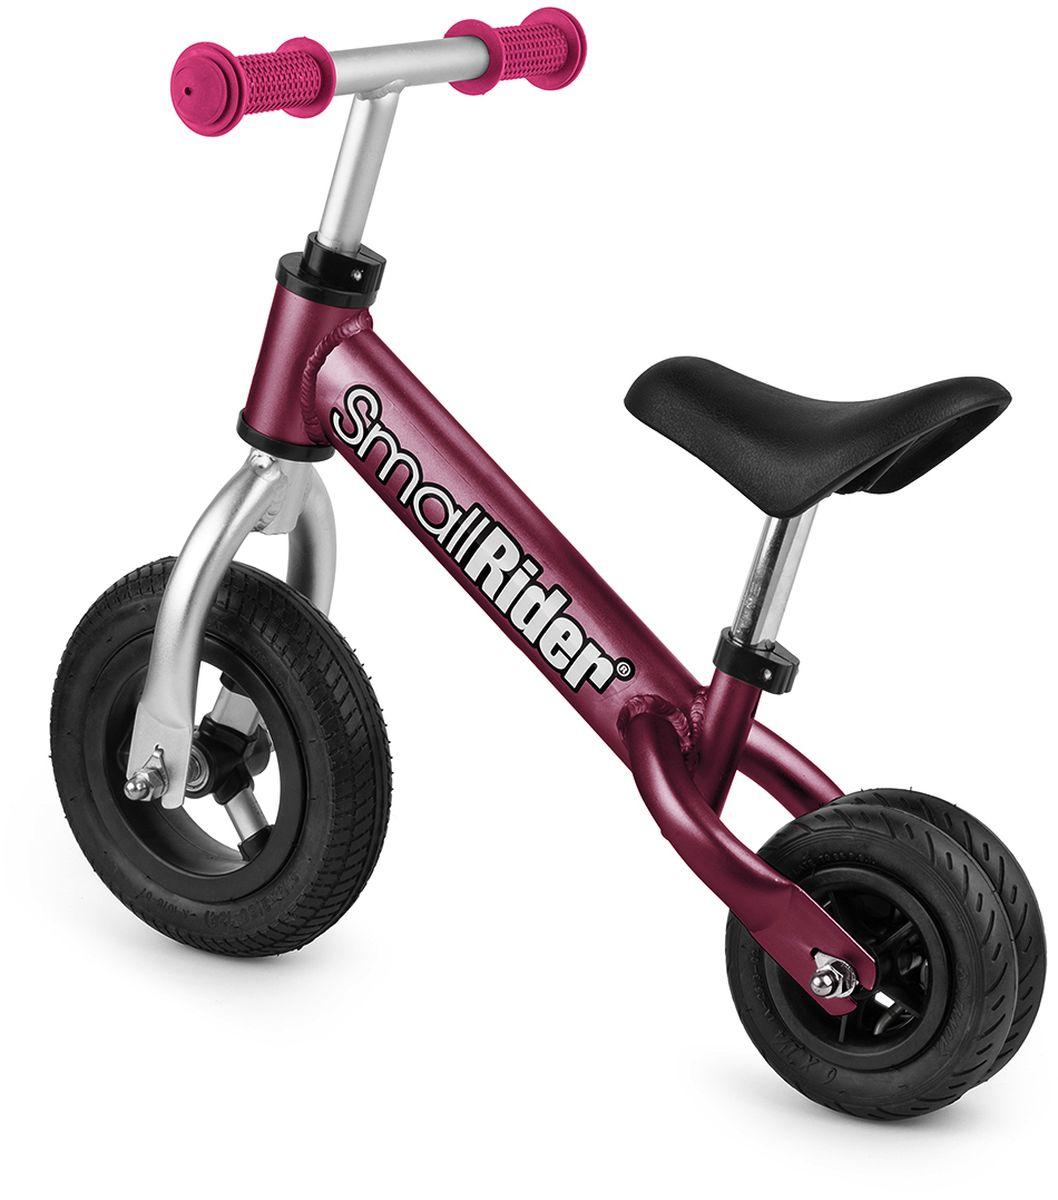 Small Rider Беговел-каталка для малышей Jimmy цвет бордовый